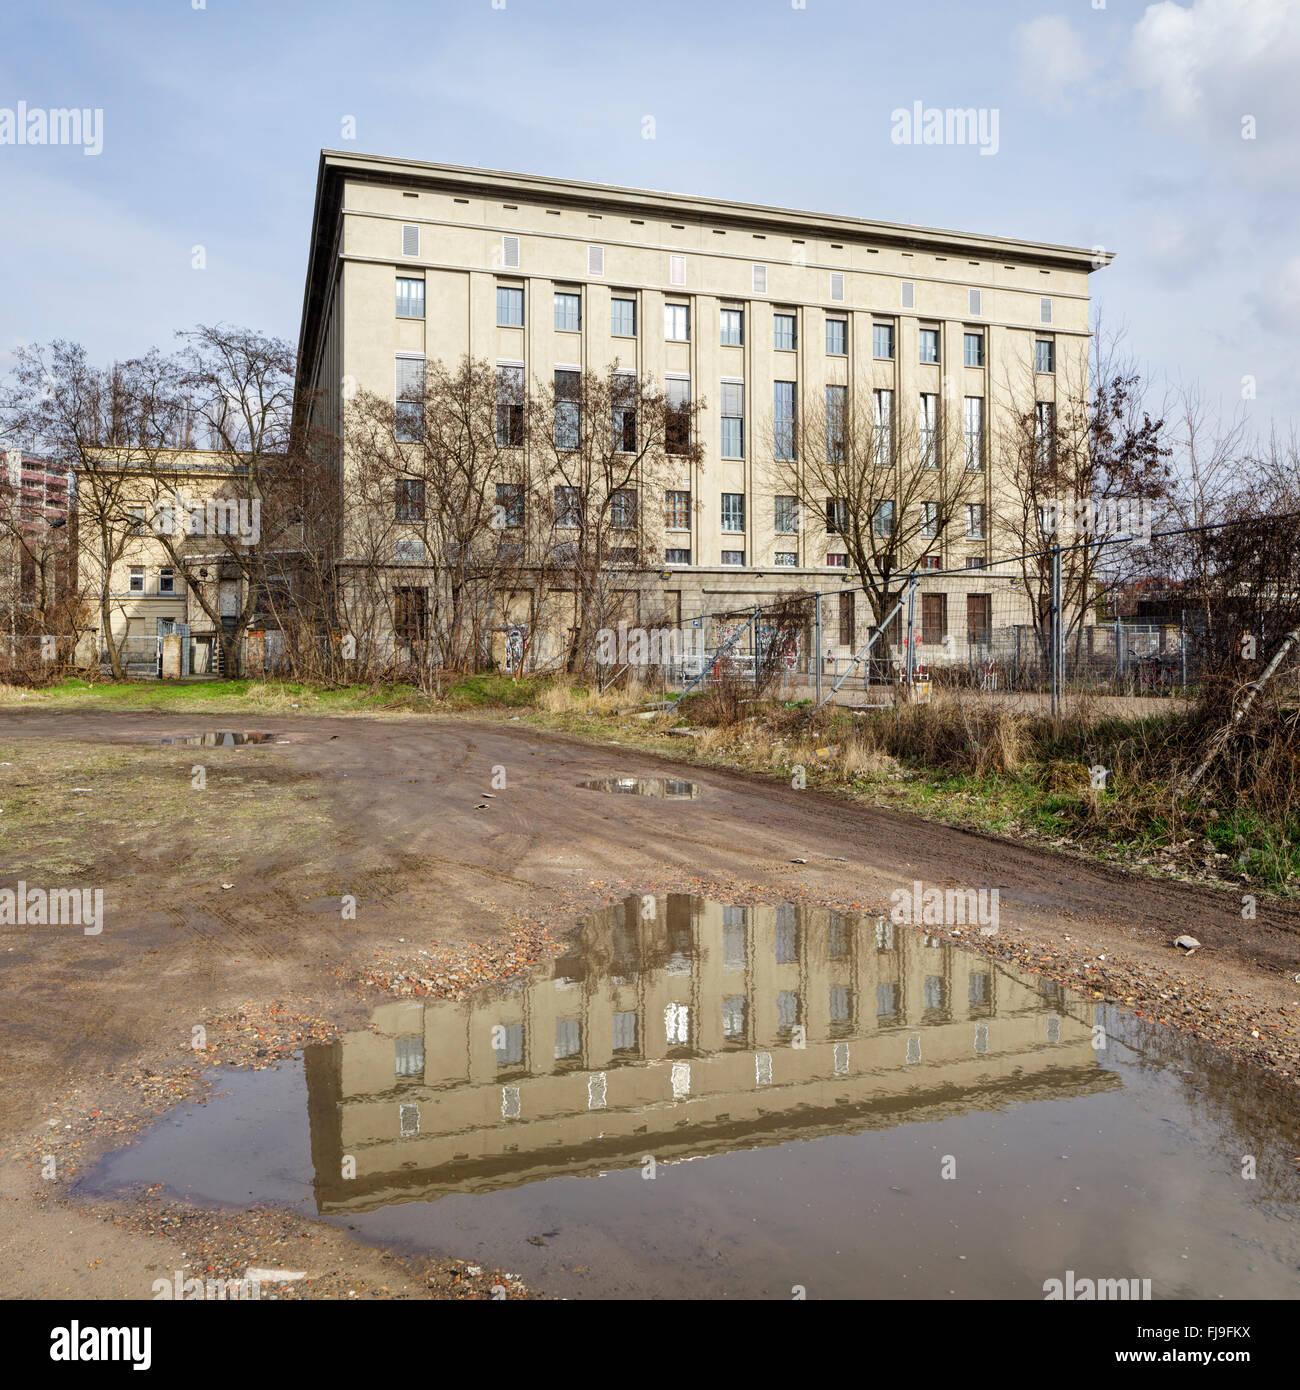 Club Berlin Berghain